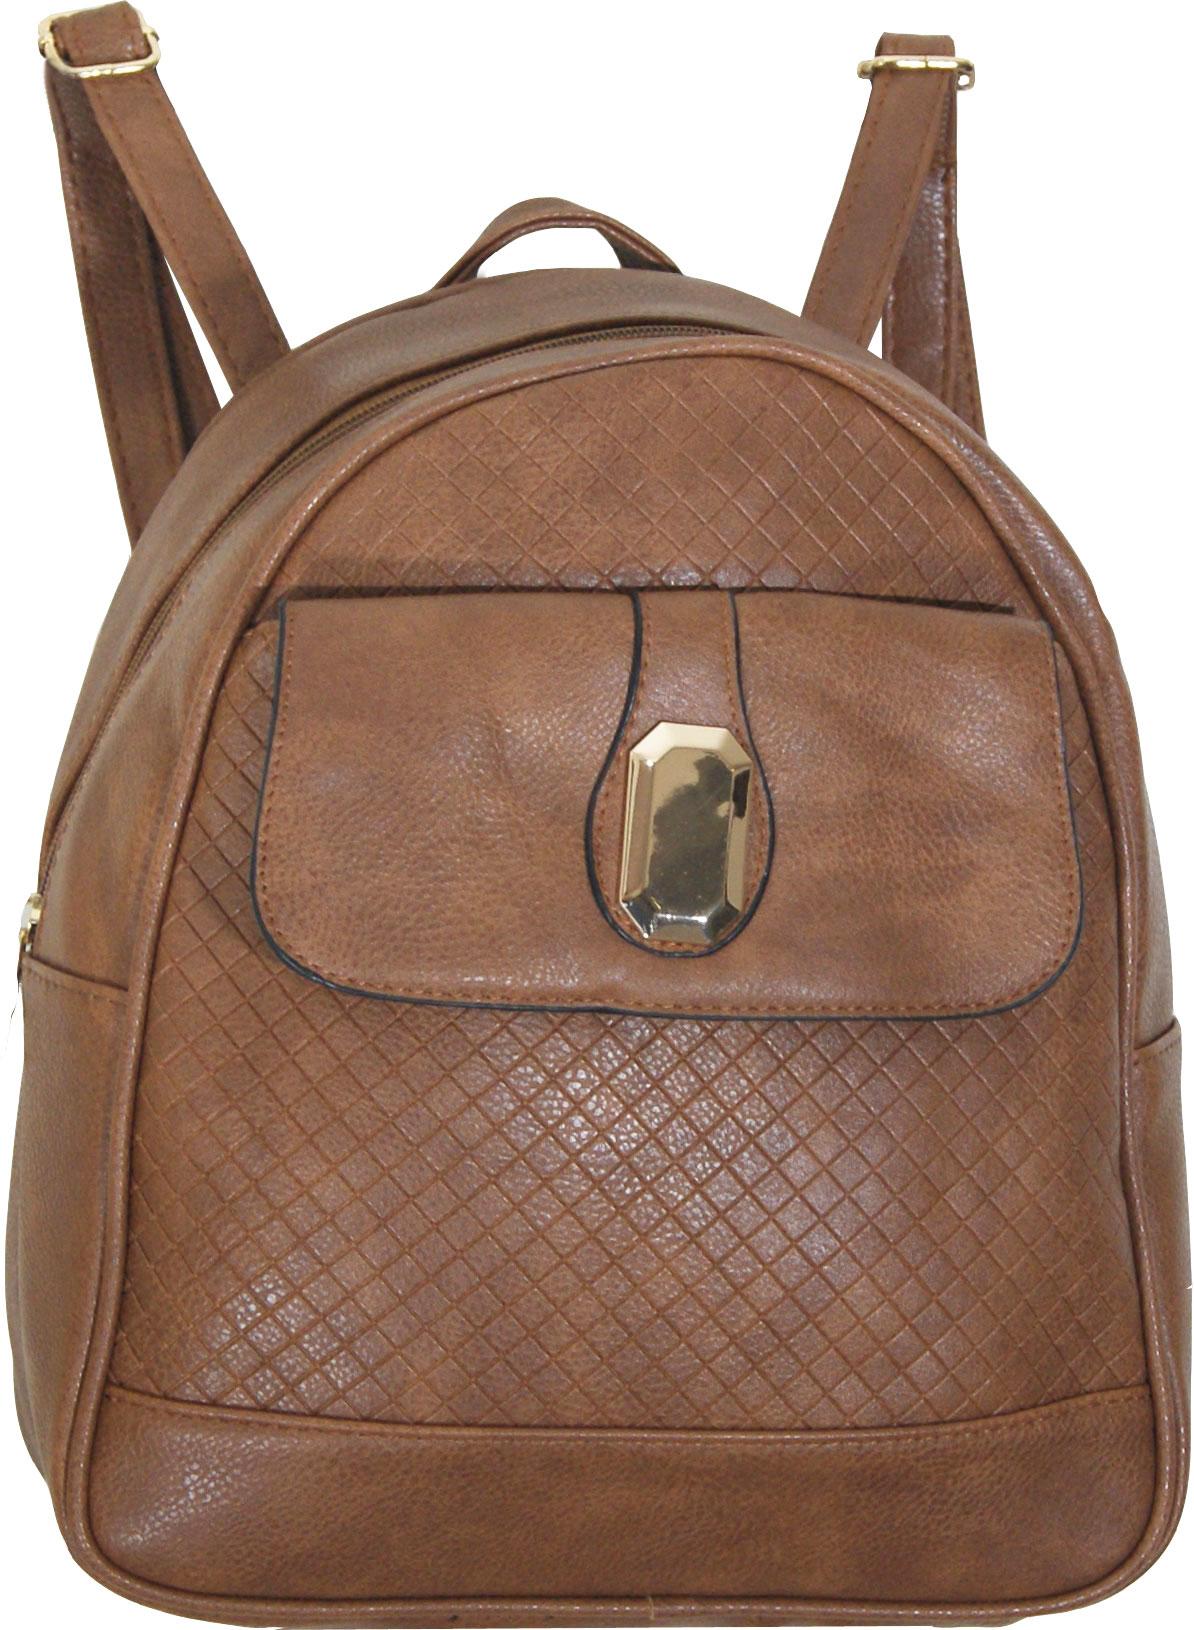 Backpack No 3005 - Ταμπά σκούρο (Silvio 3005)